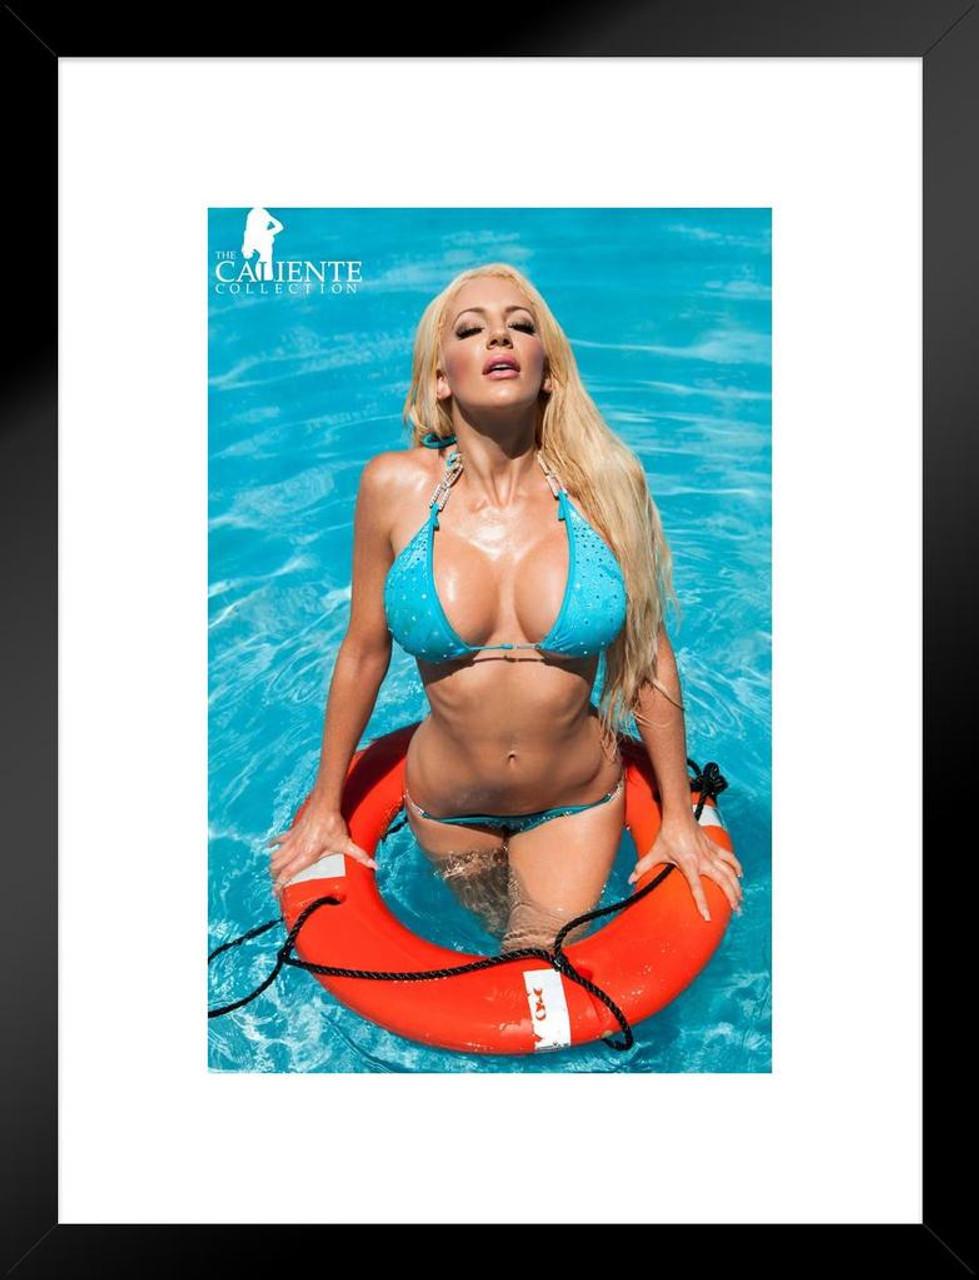 Shea pics nicolette 49 Hot